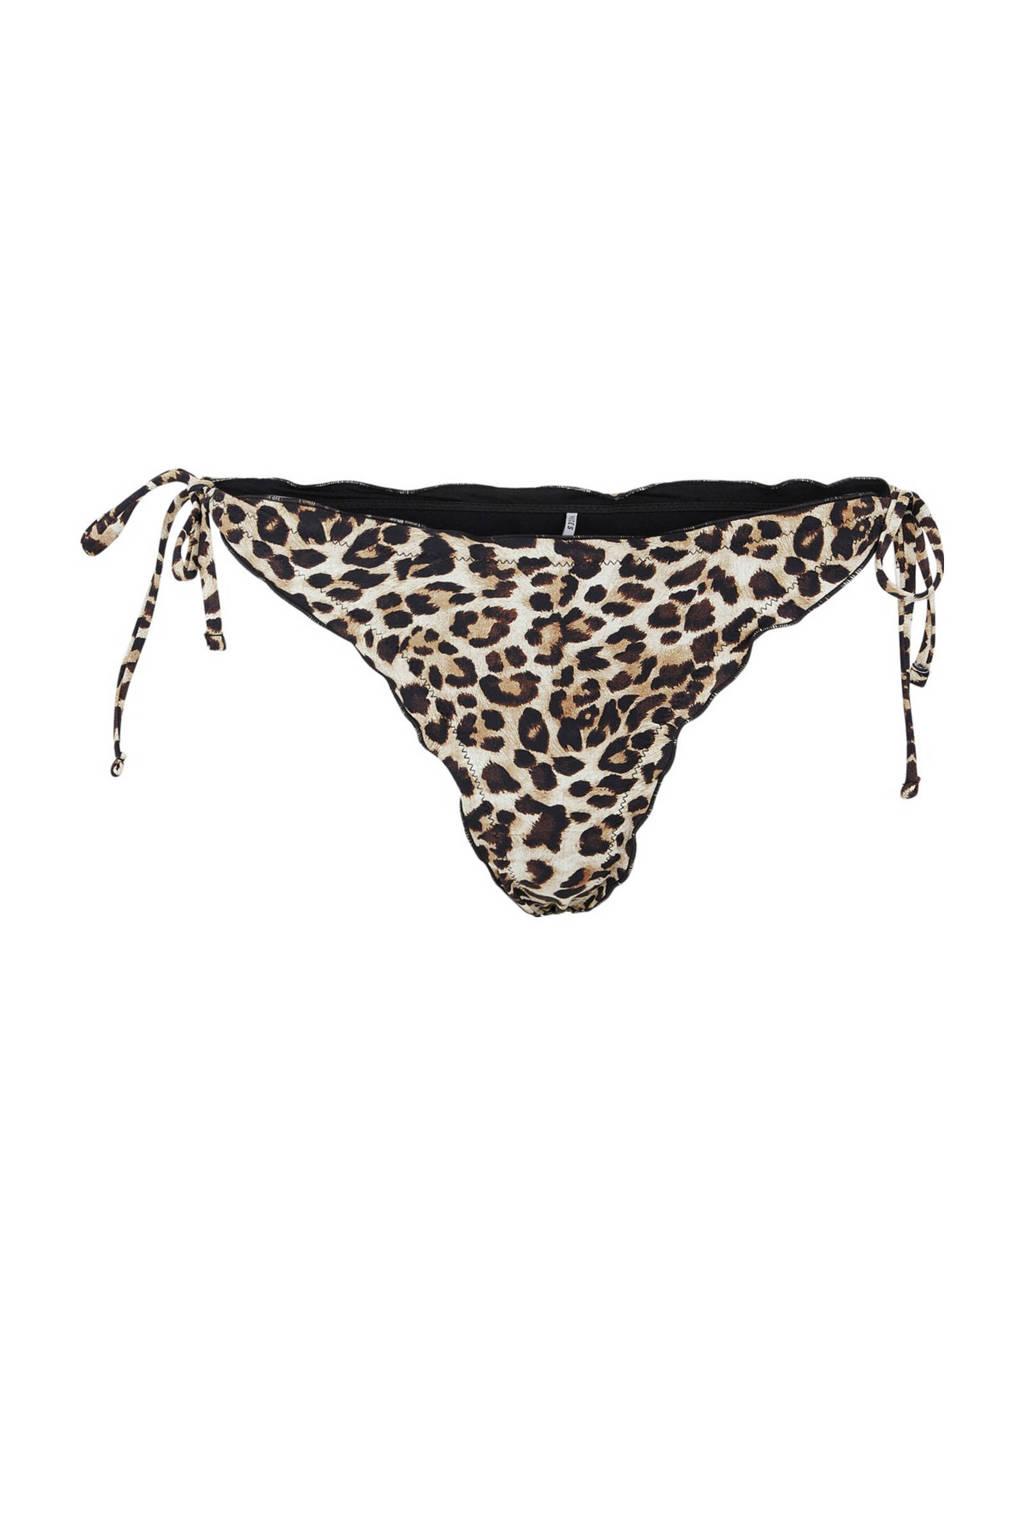 PIECES strik bikinibroekje Gaby met panterprint bruin/beieg, Bruin/beuge